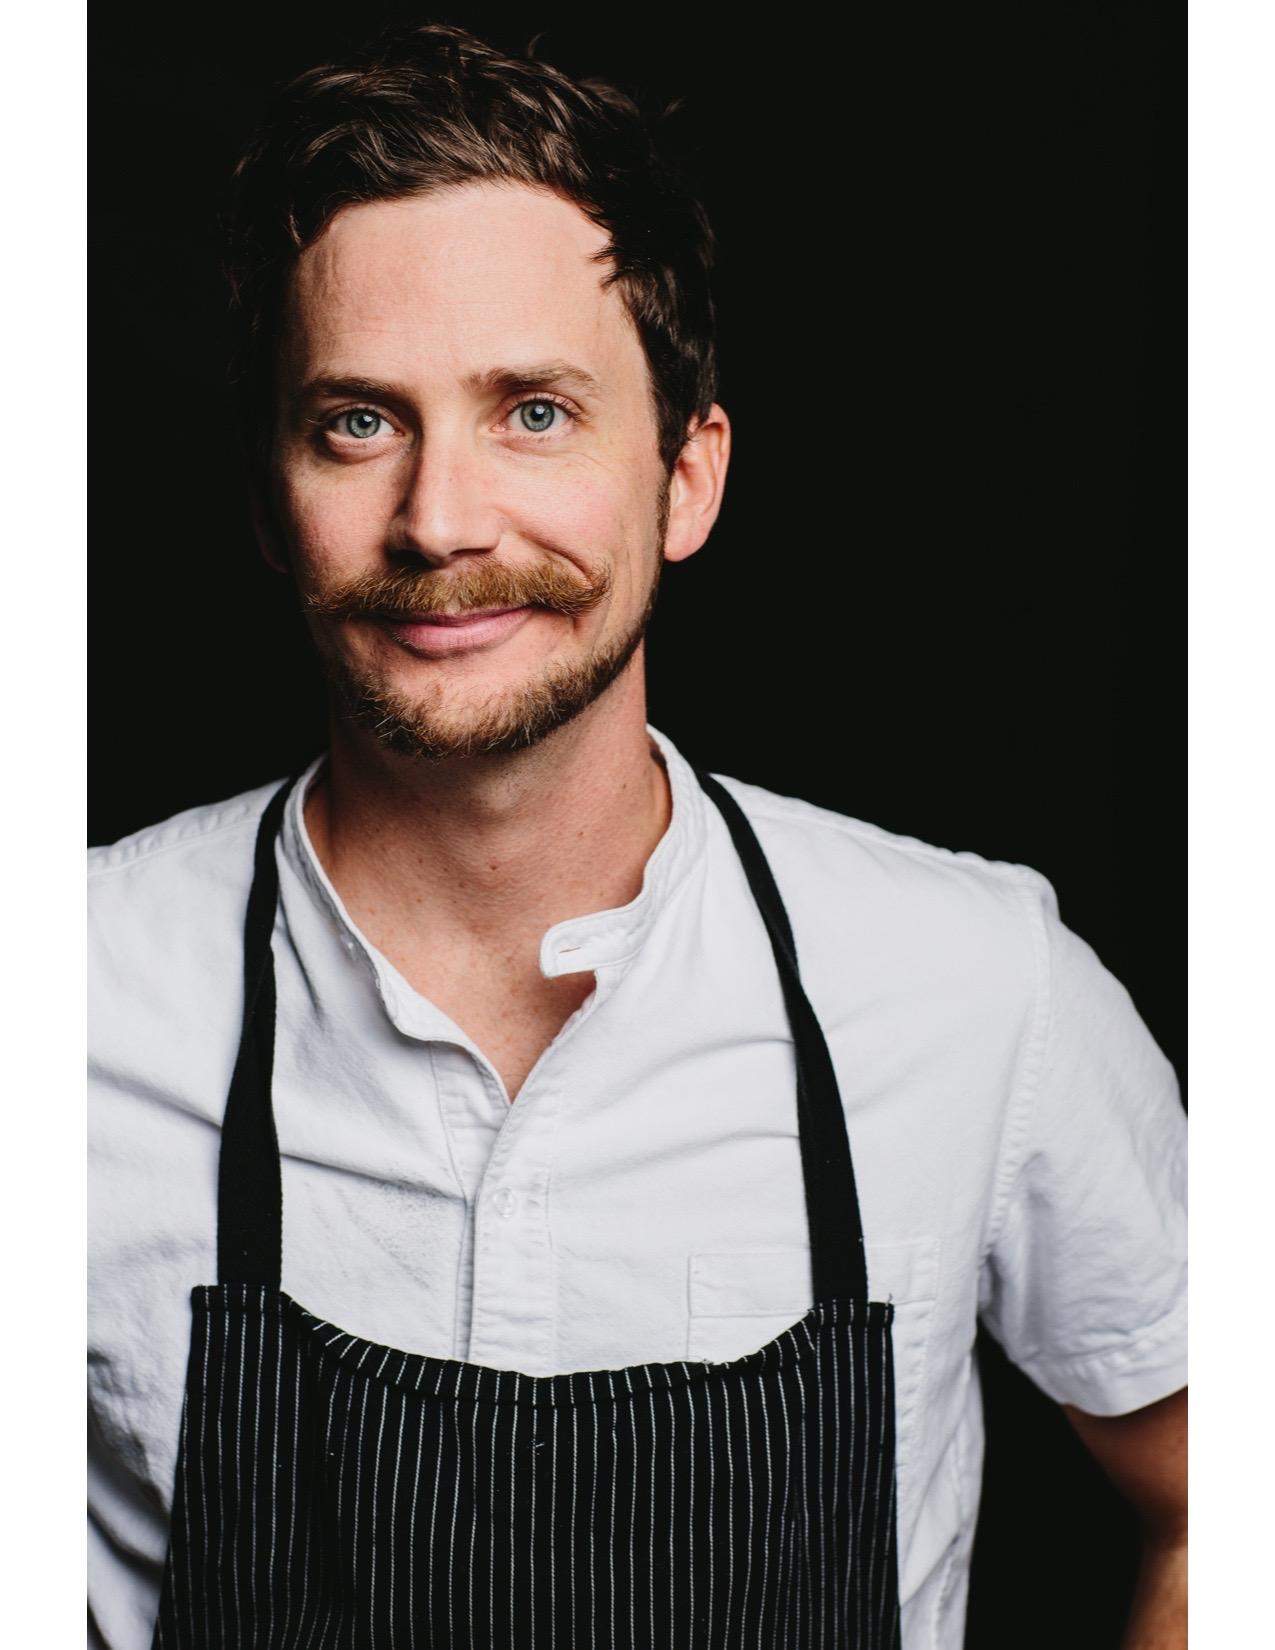 Former Atlanta Chef To Open a Gulf Seafood Restaurant in Birmingham